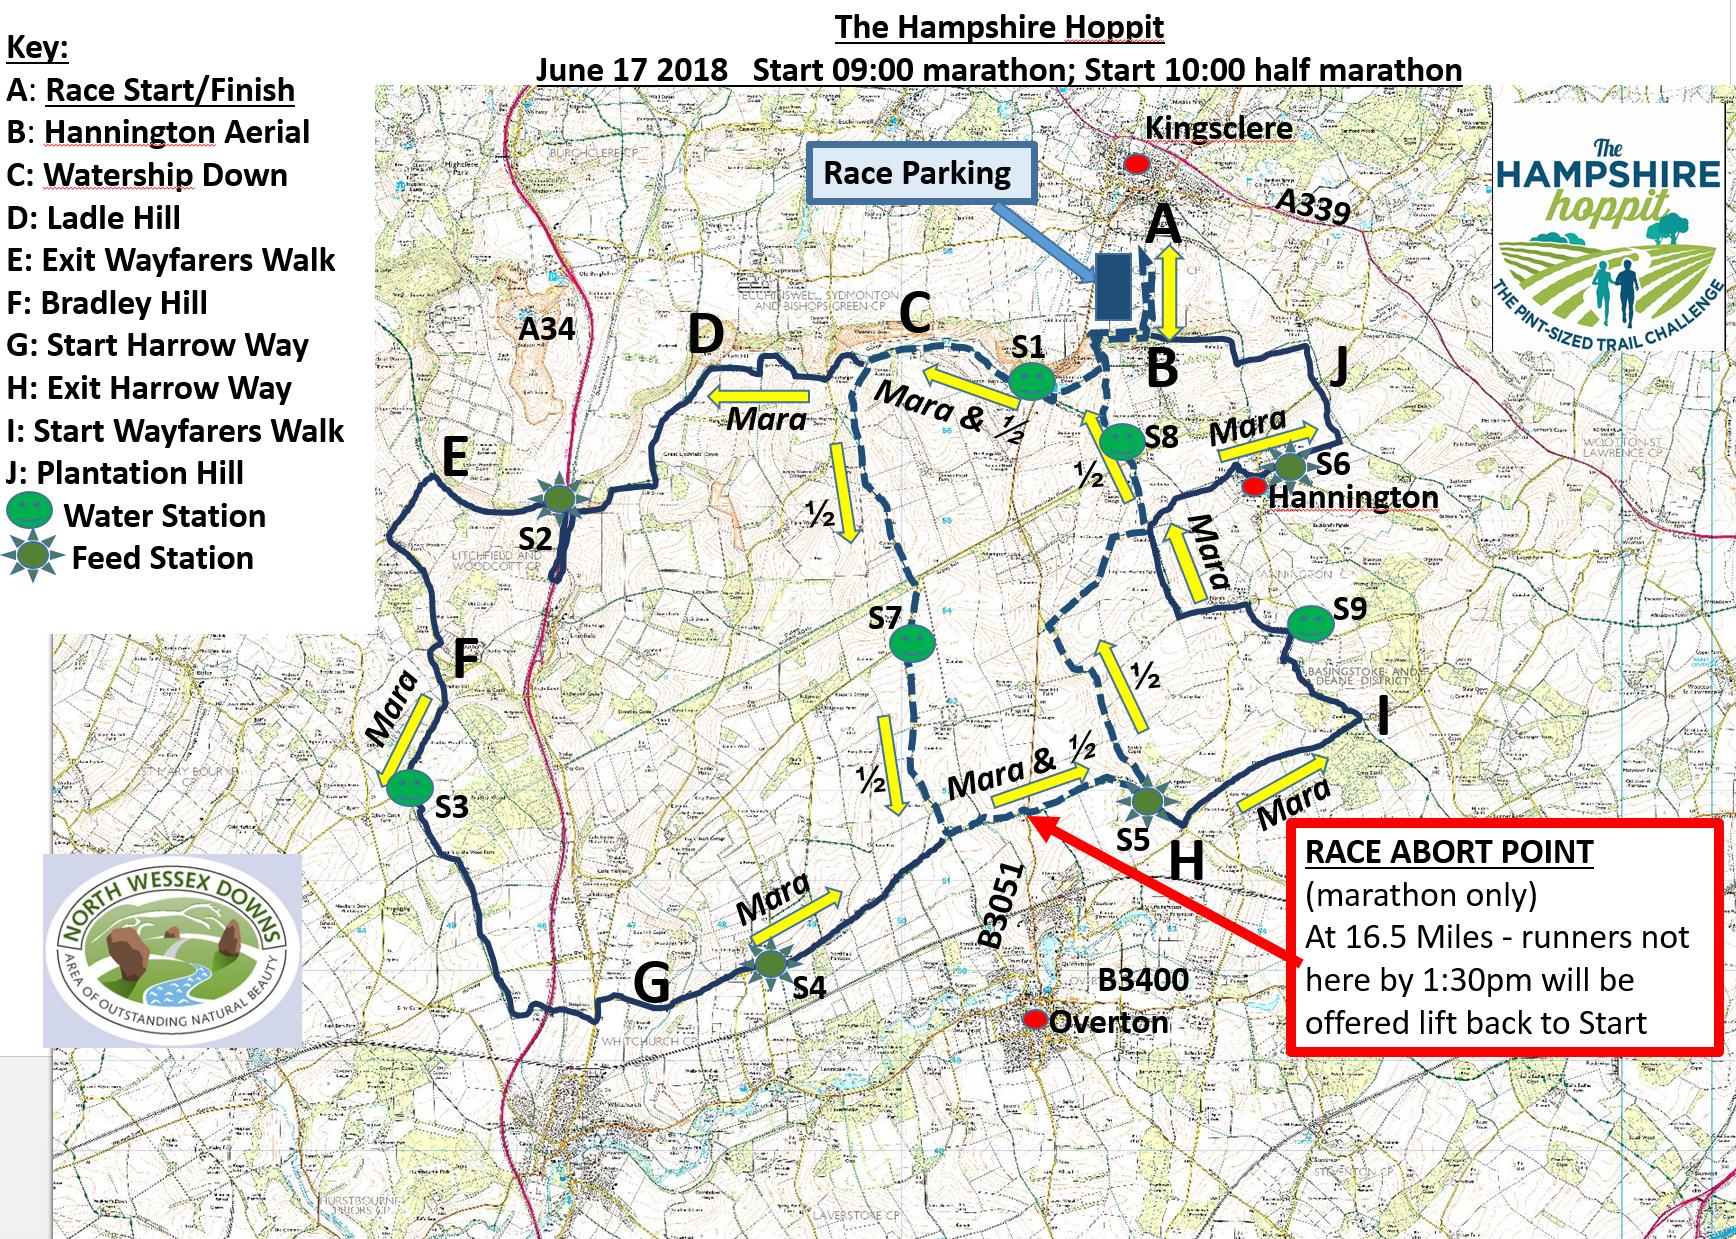 Map Of Uk Hampshire.Route Maps The Hampshire Hoppit